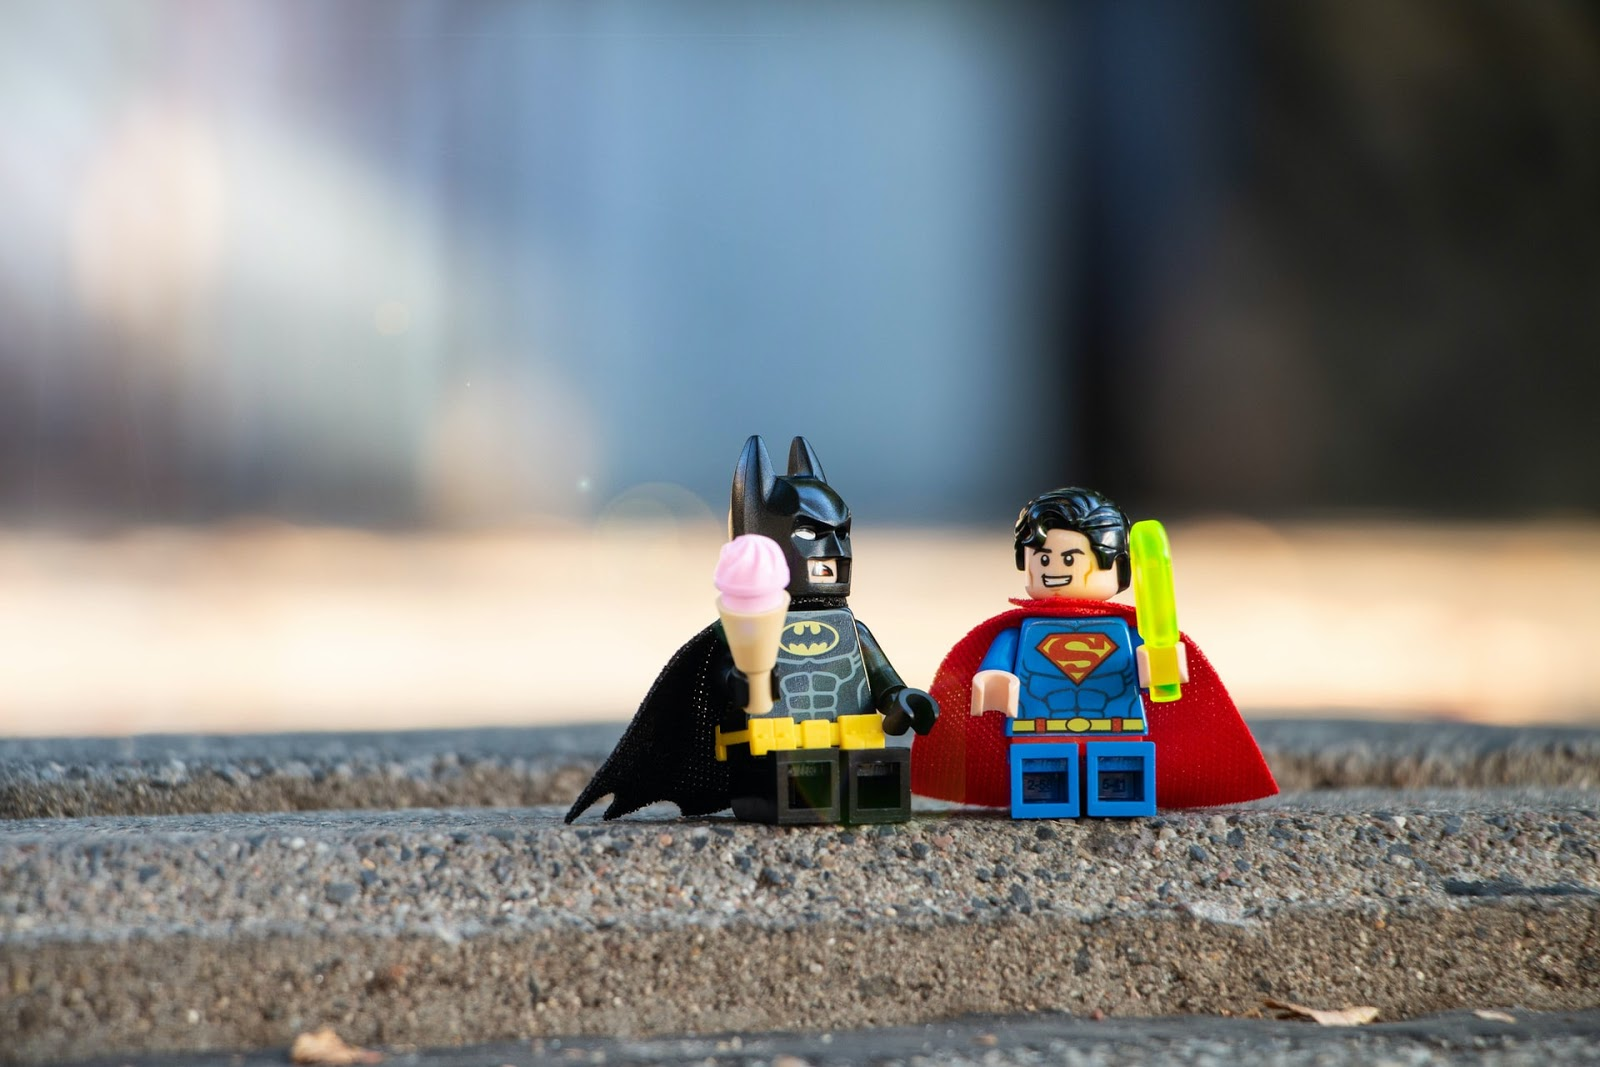 A lego batman and superman, each holding an ice cream cone, sit on a sidewalk.